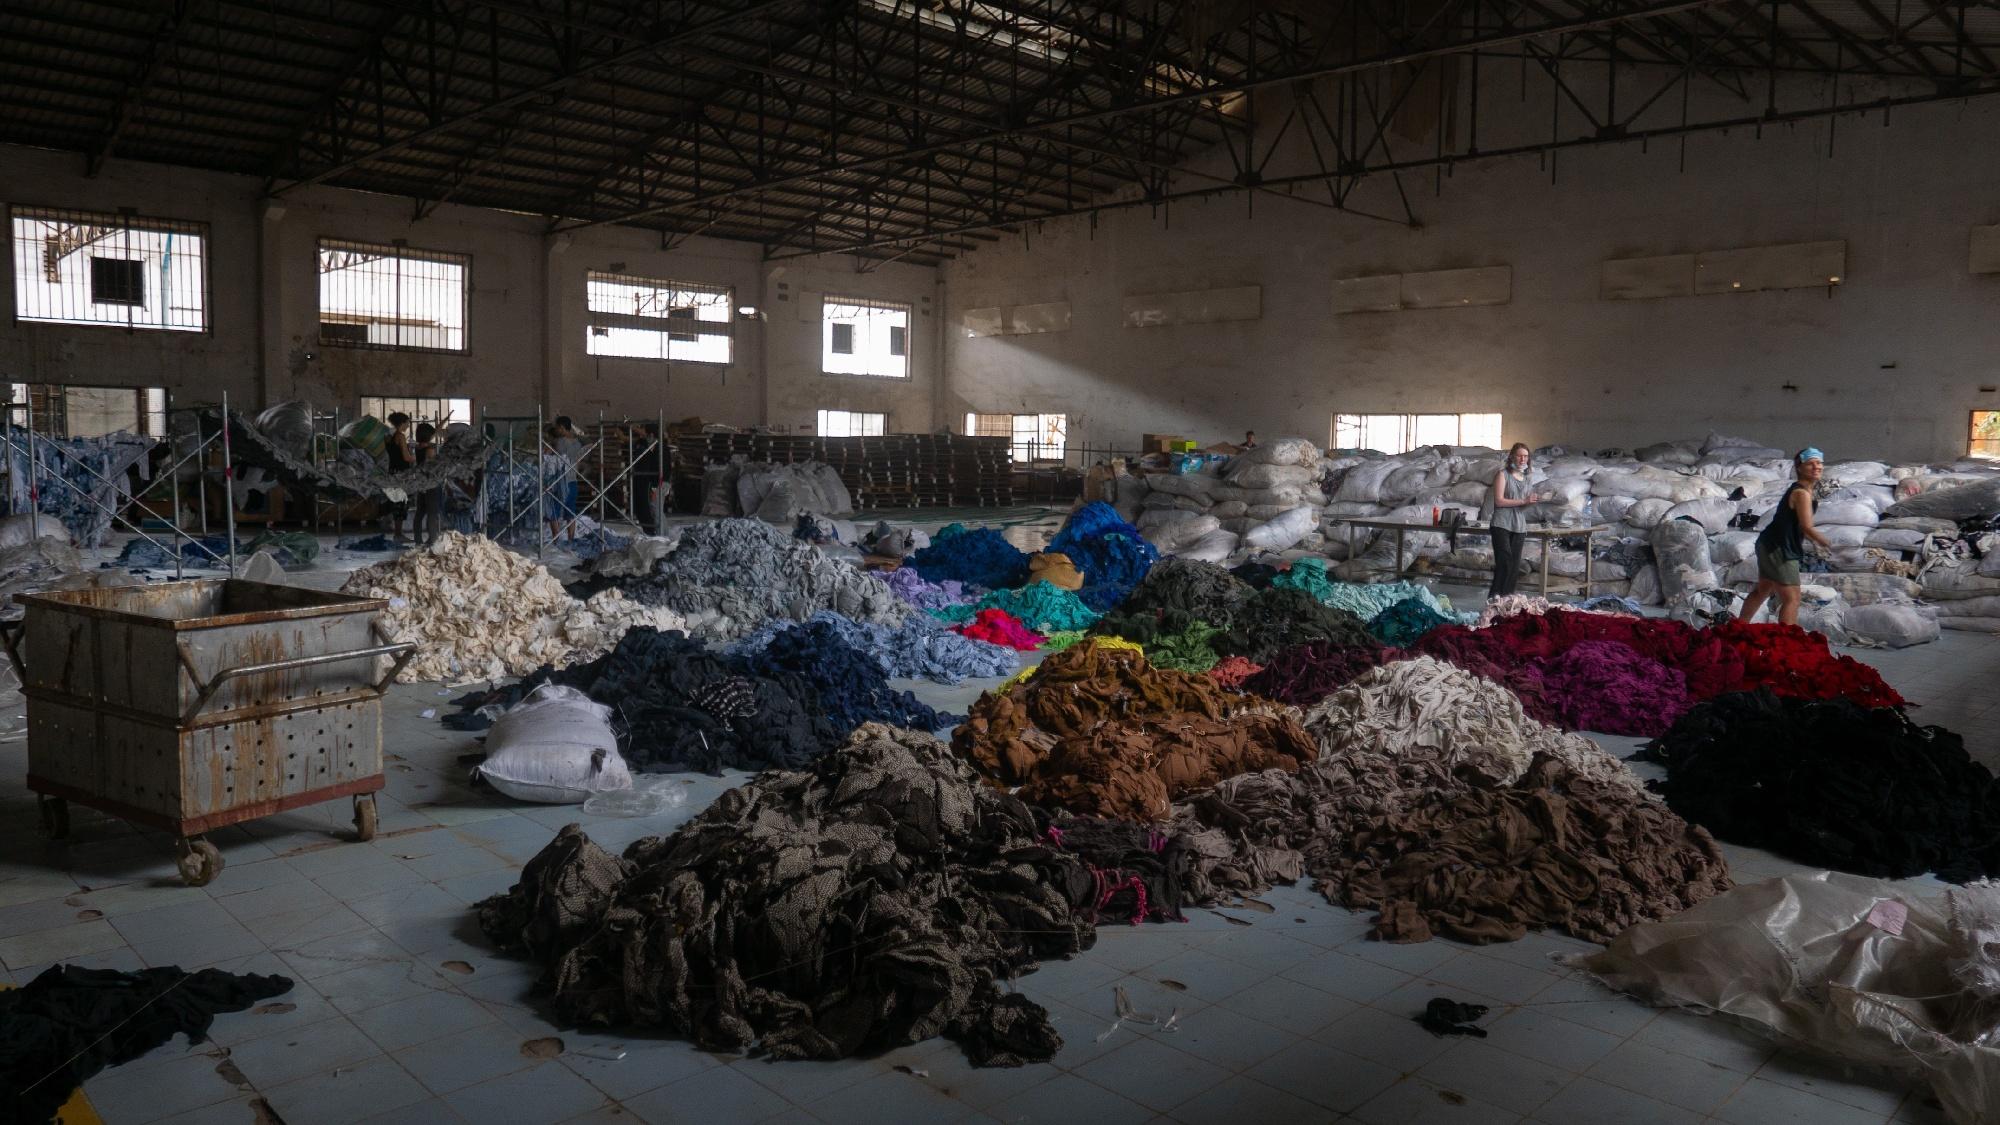 Shredded clothing